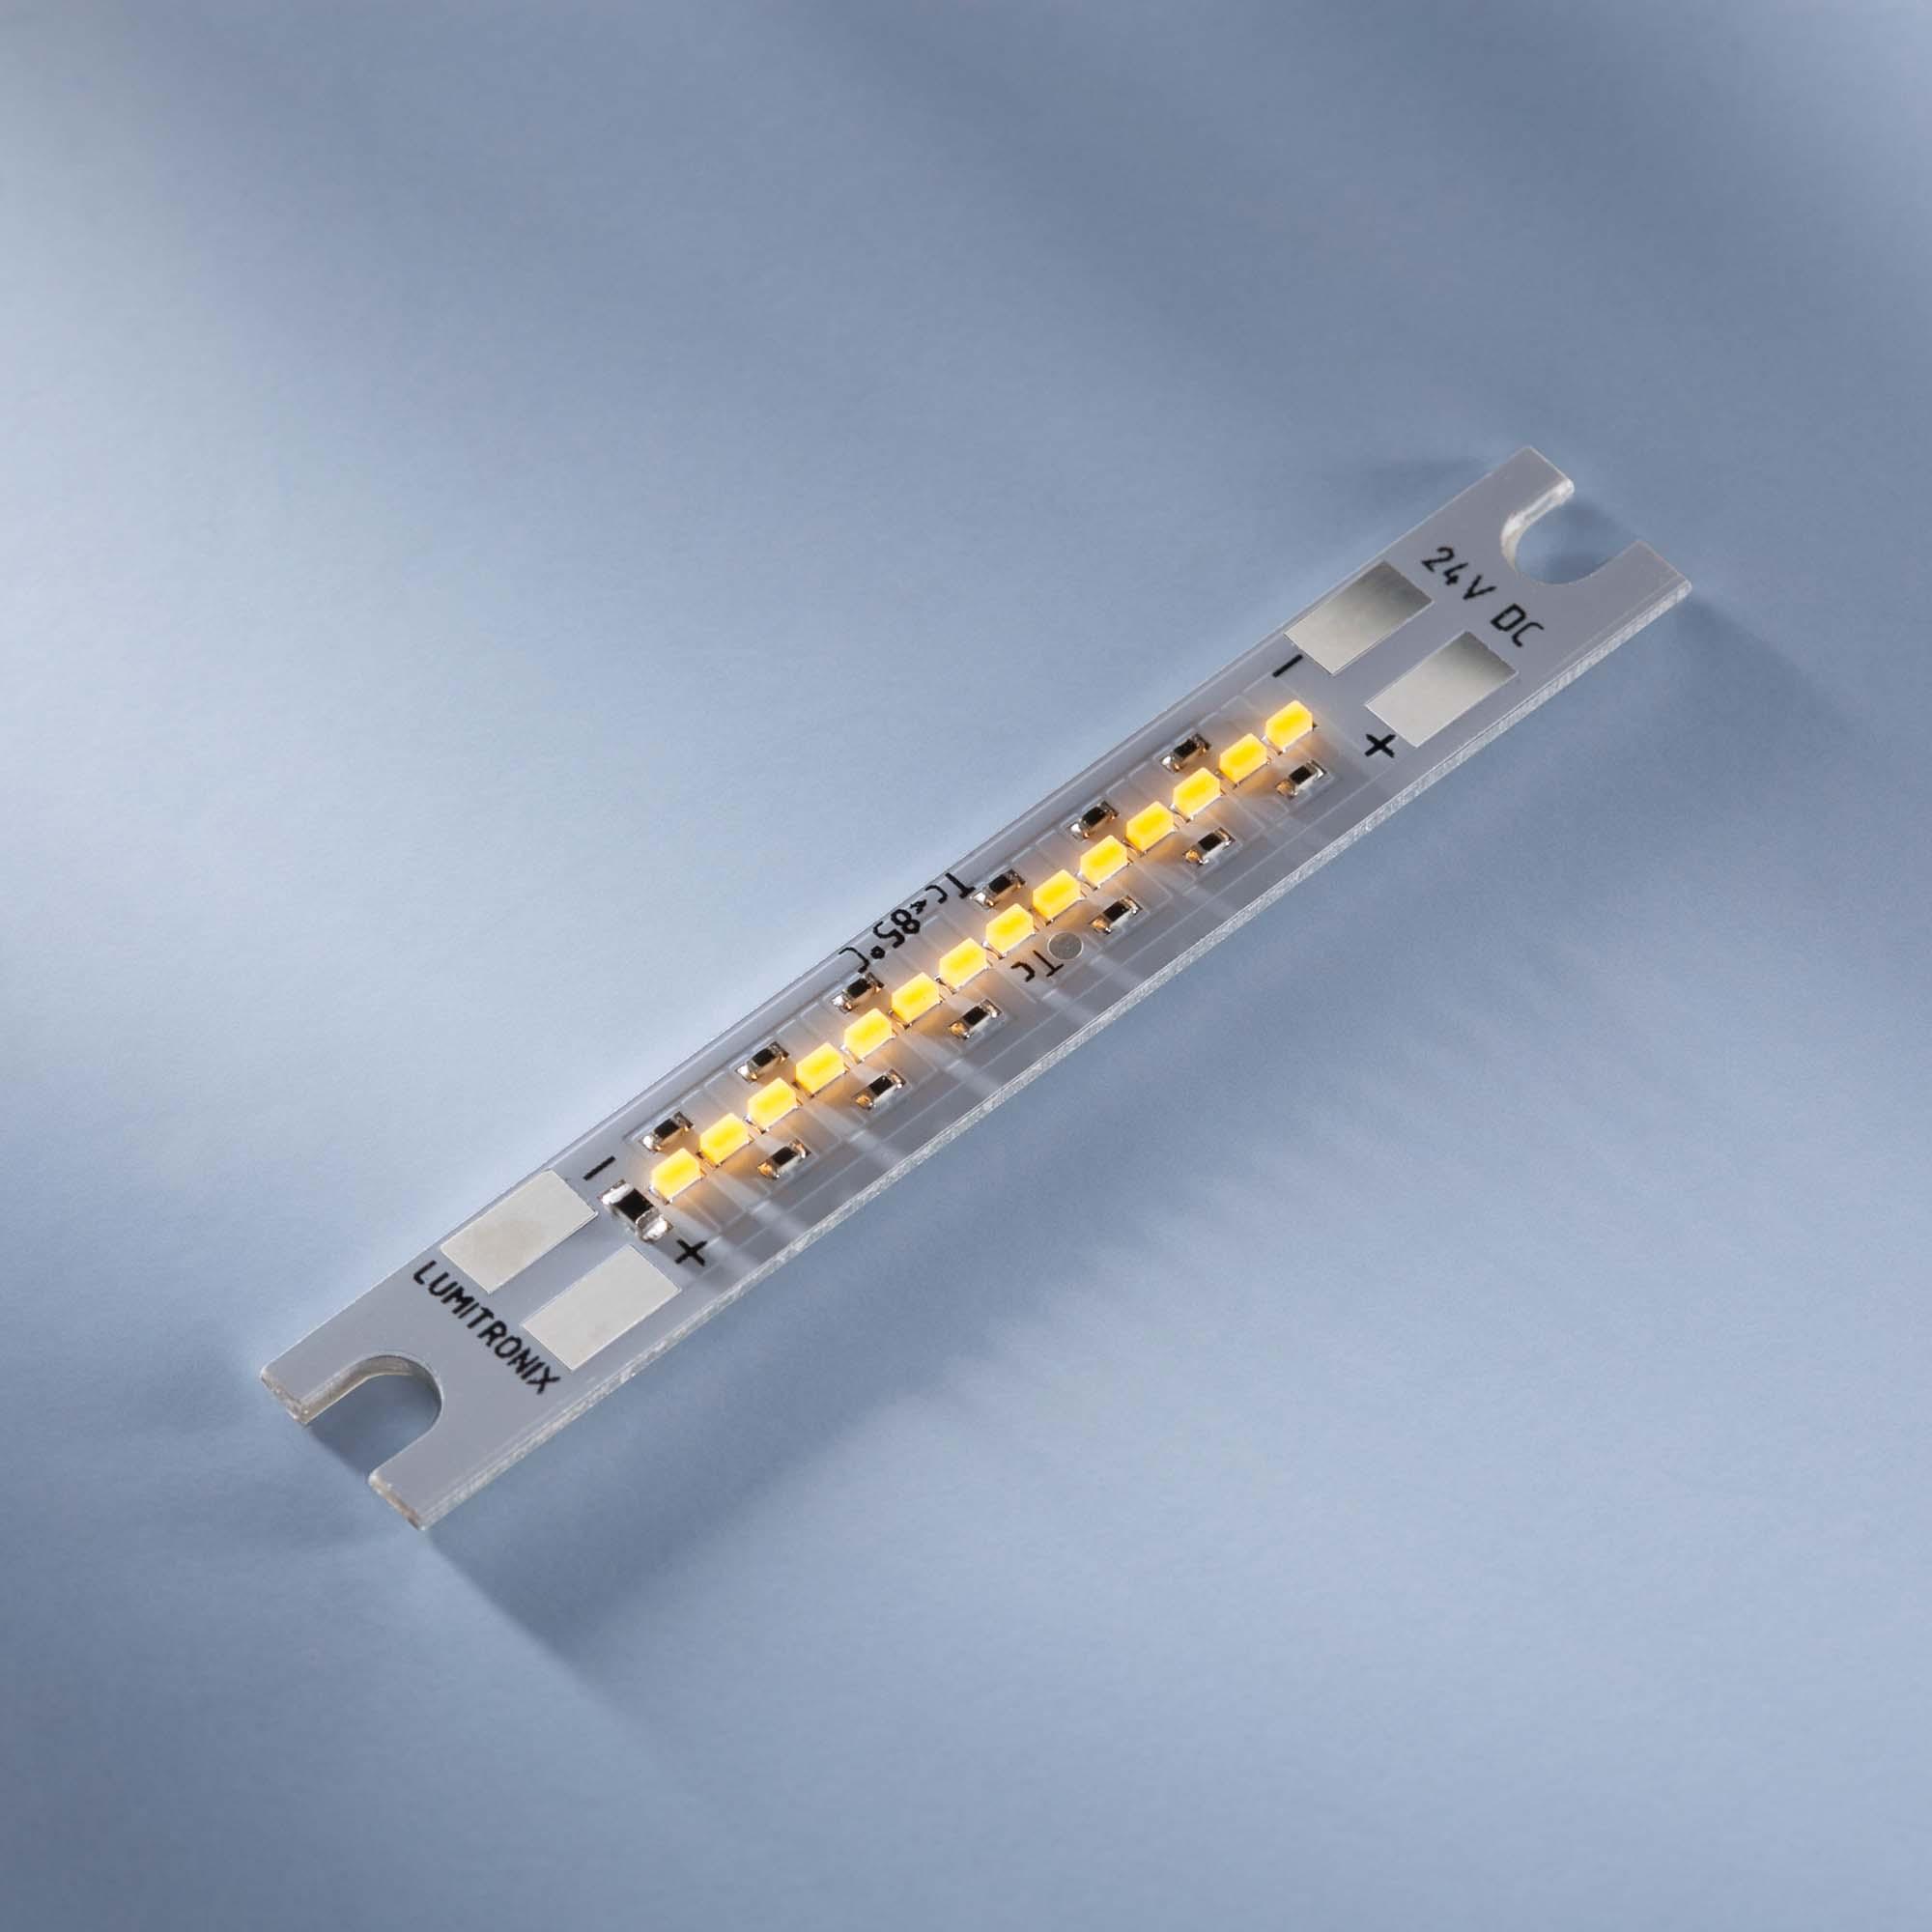 LUMITRONIX SmartArray 24V, 2700K, 360lm 53683